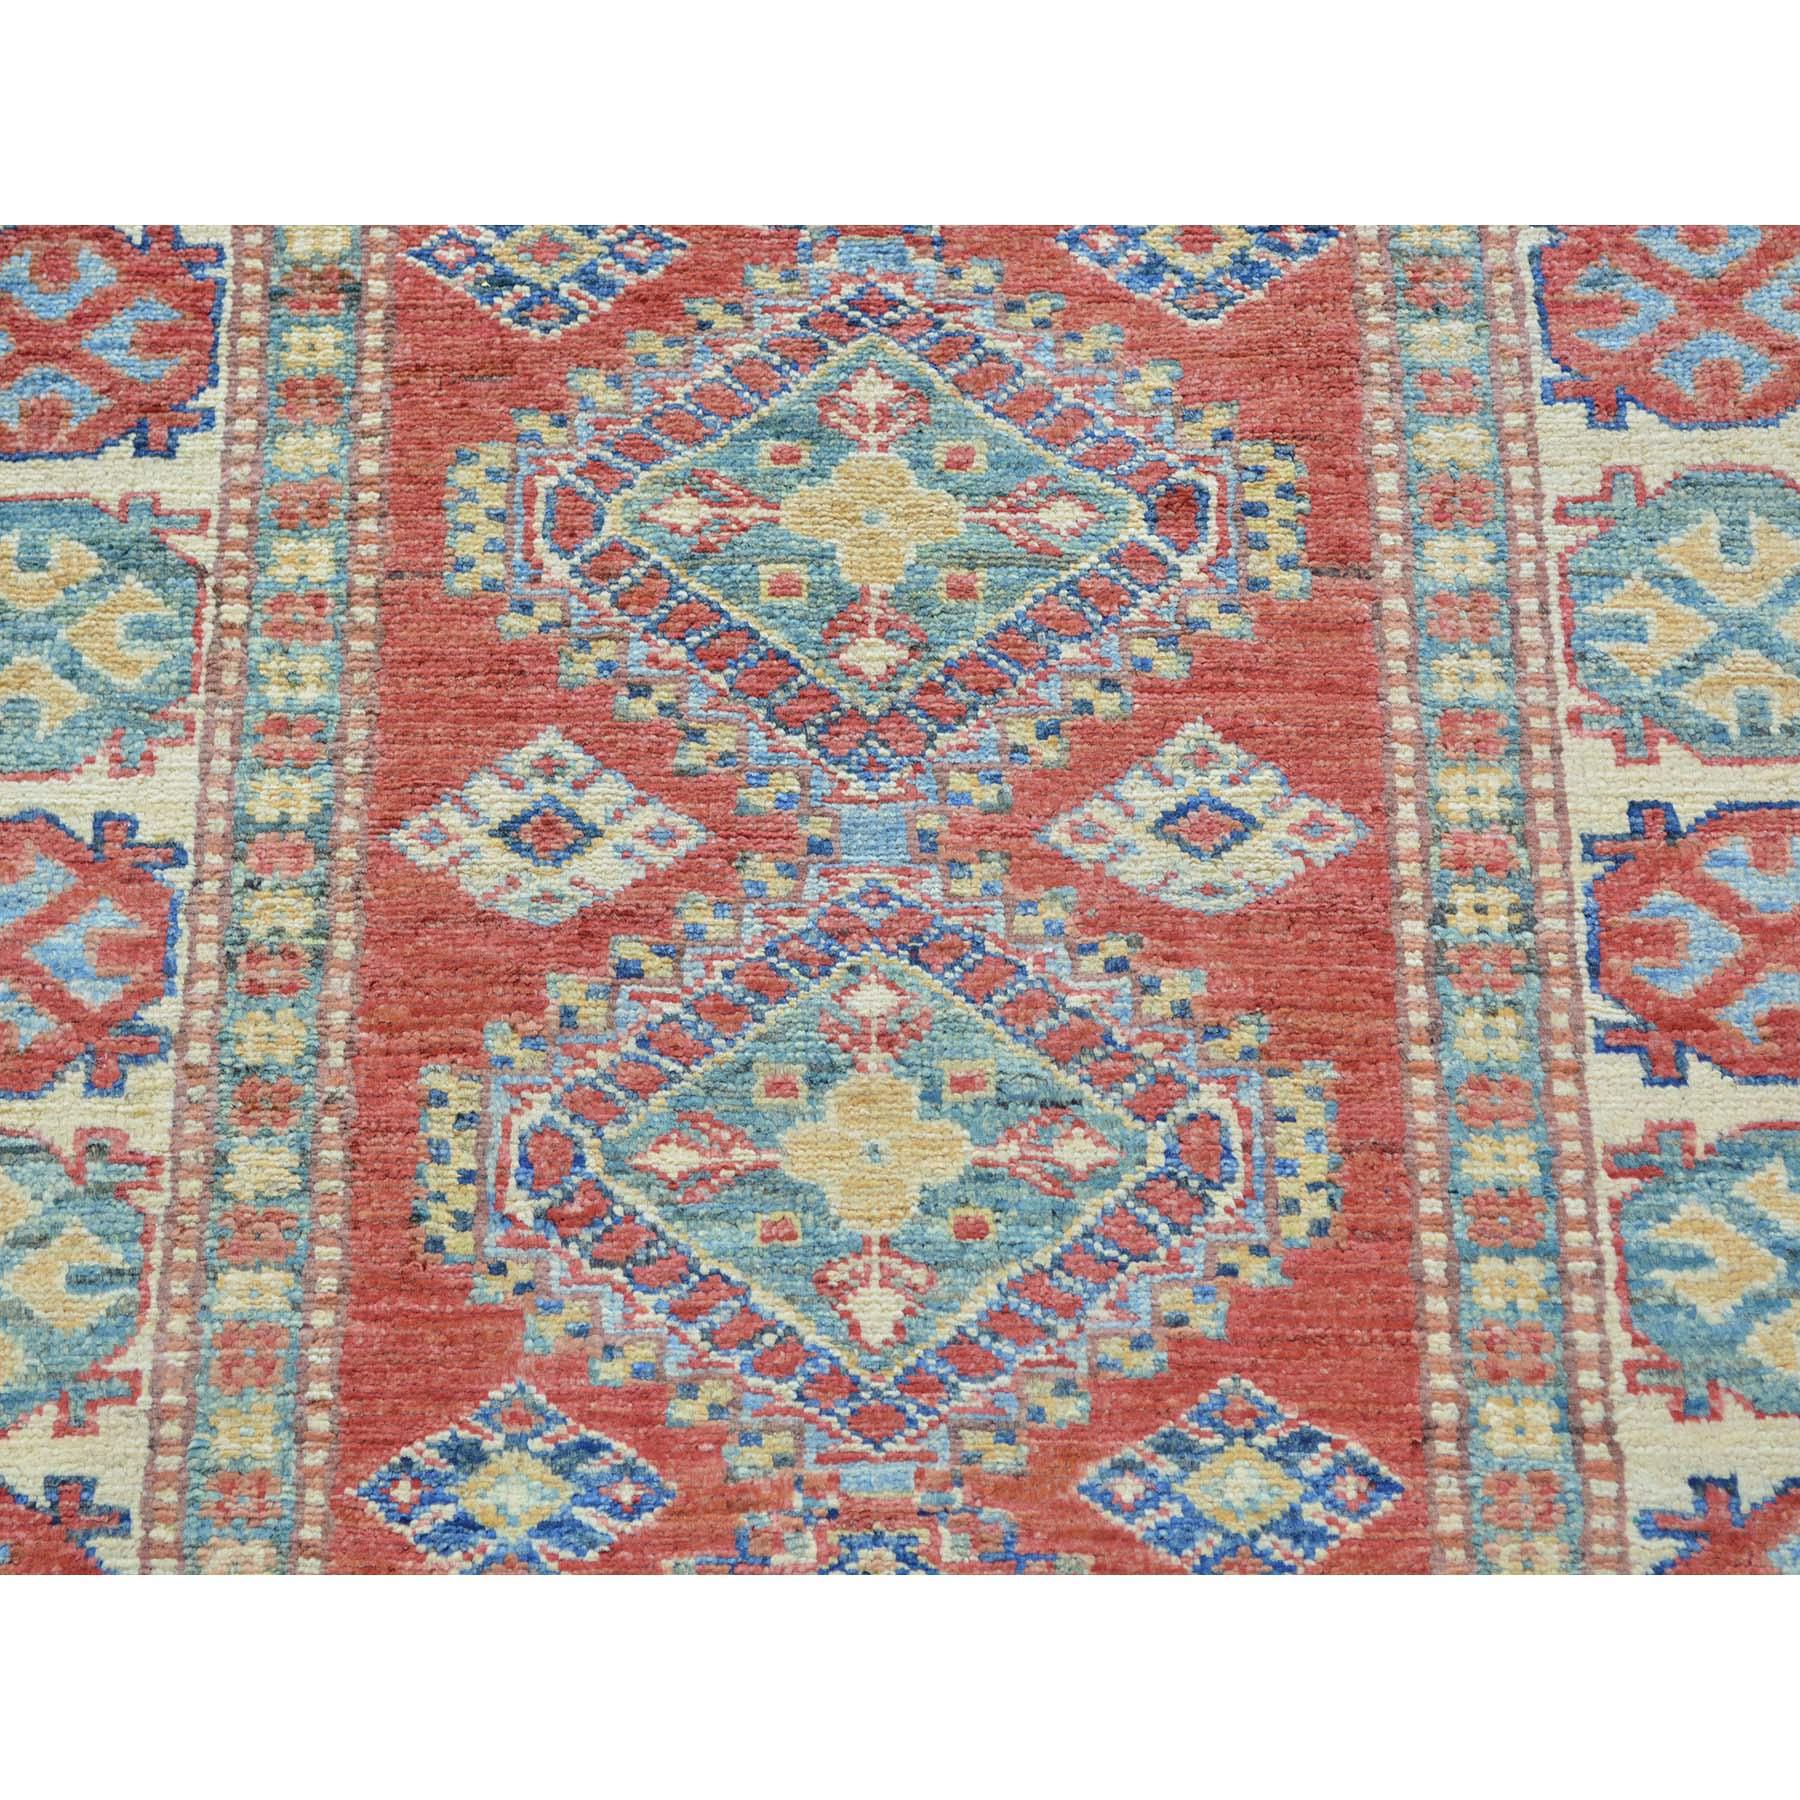 2-9 x10- Red Super Kazak Runner Pure Wool Hand Knotted Oriental Rug